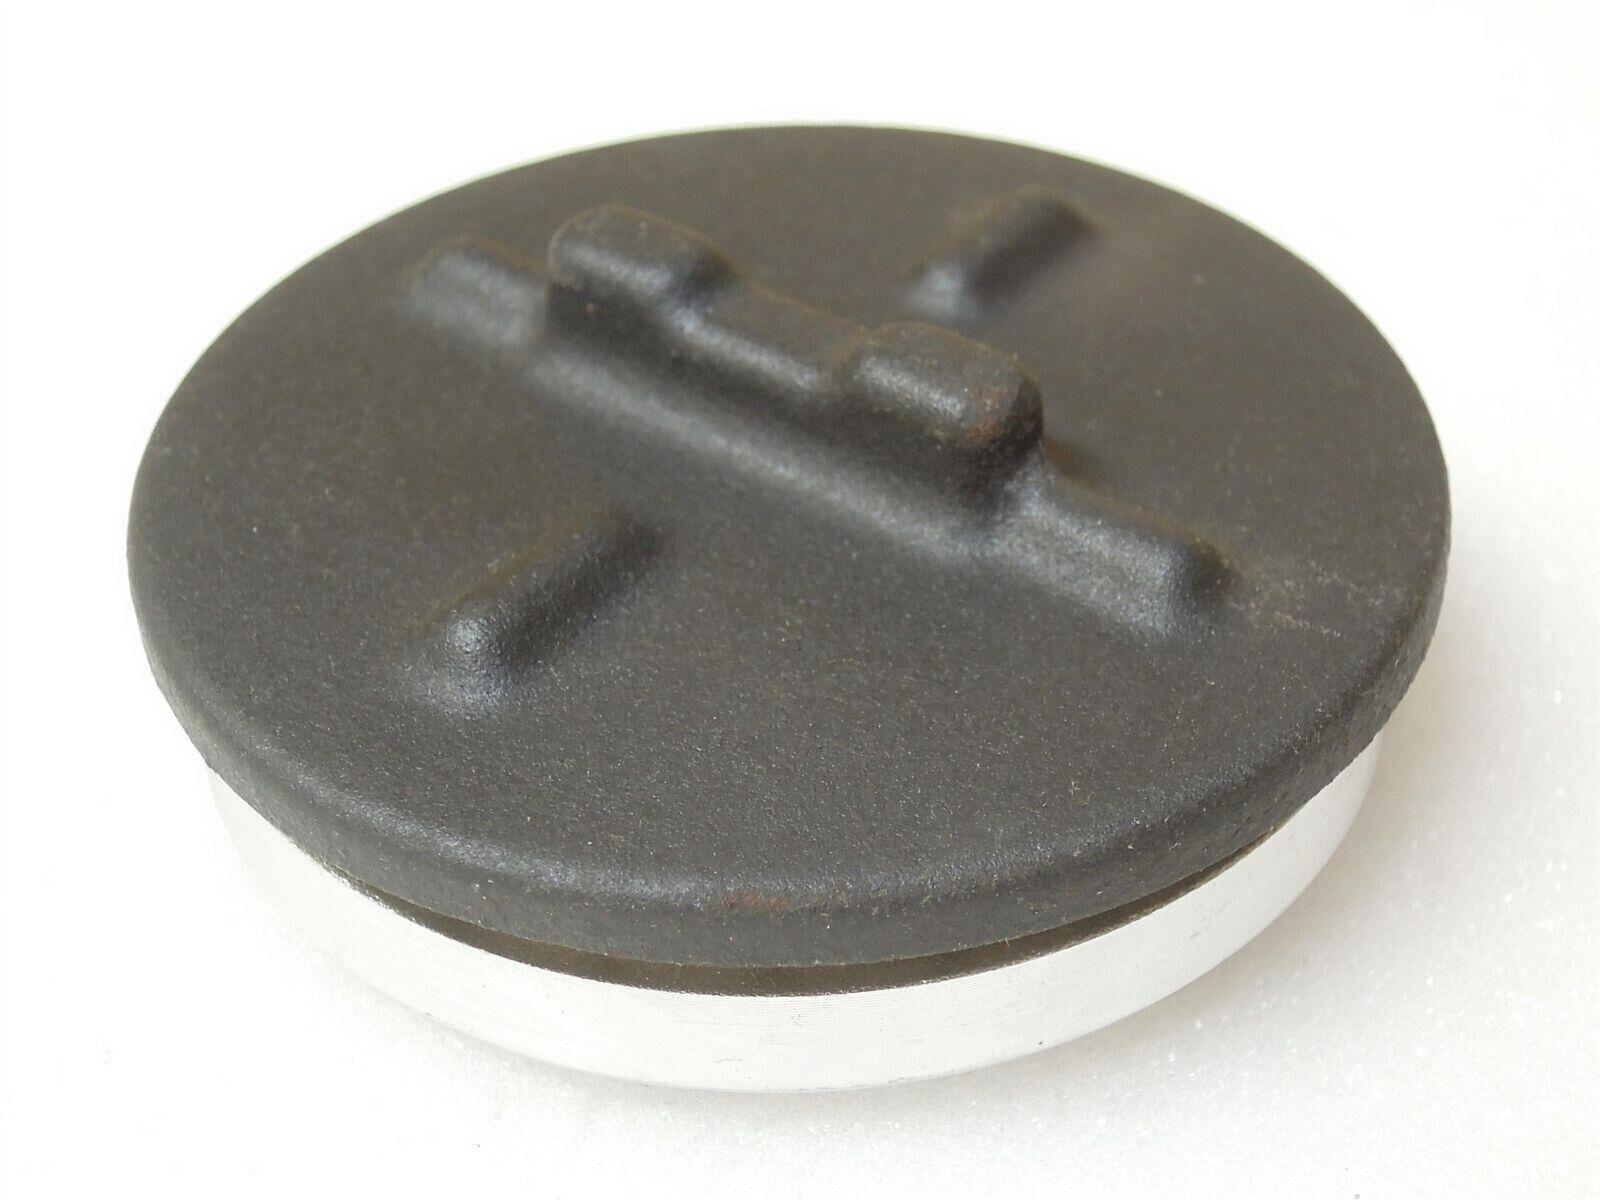 Genuine Electrolux Zanussi Medium Gas Burner Cap